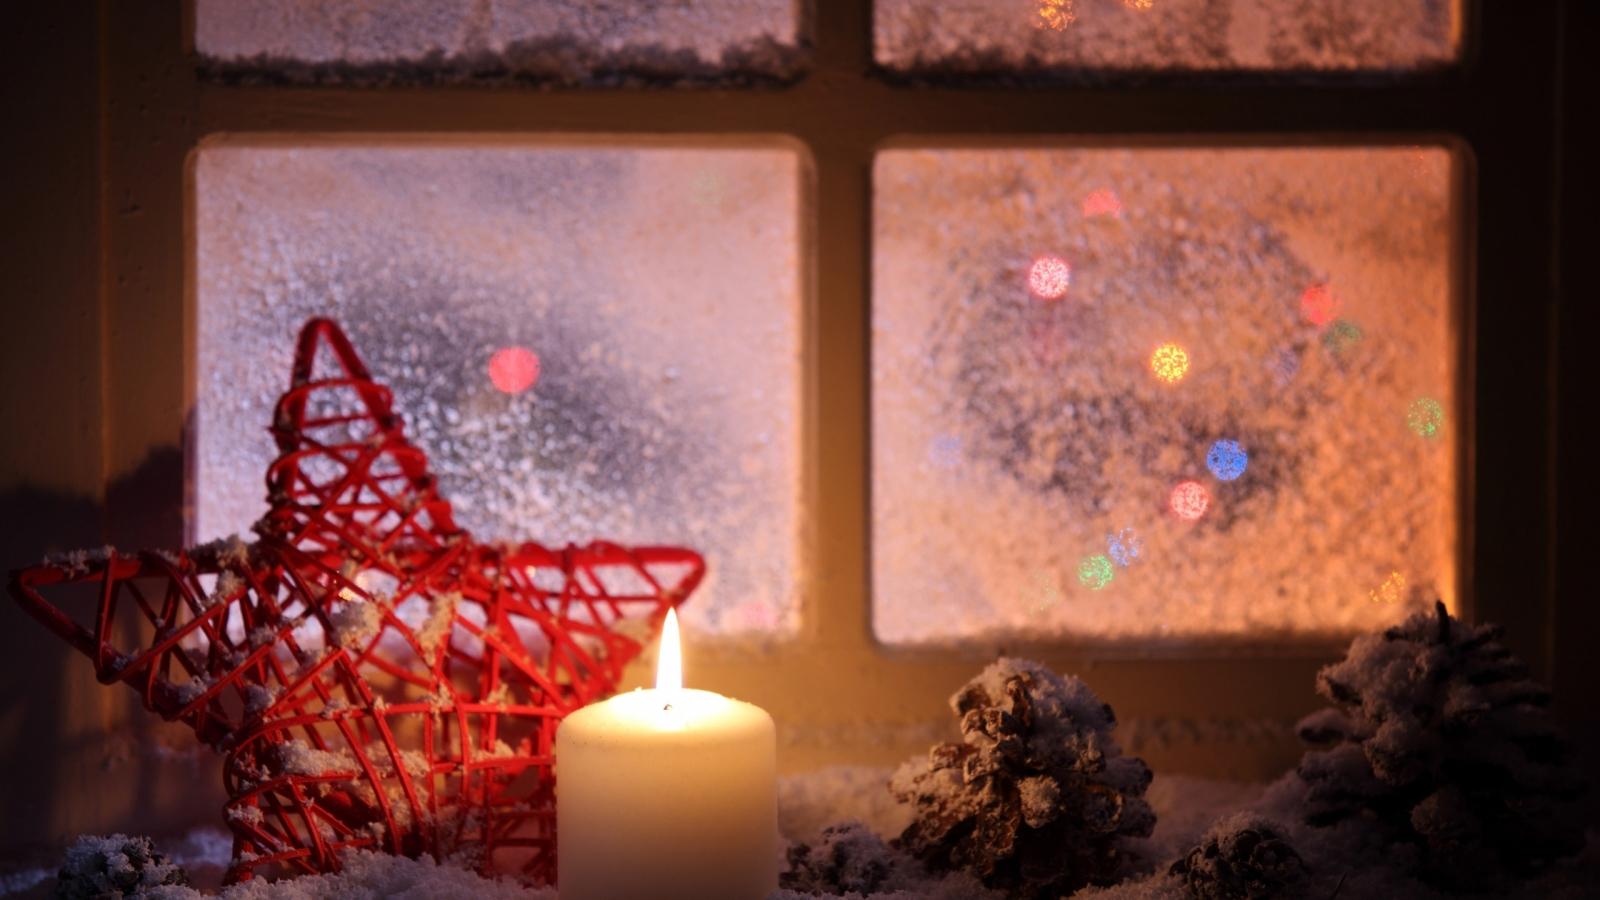 Vela junto a la ventana en navidad - 1600x900